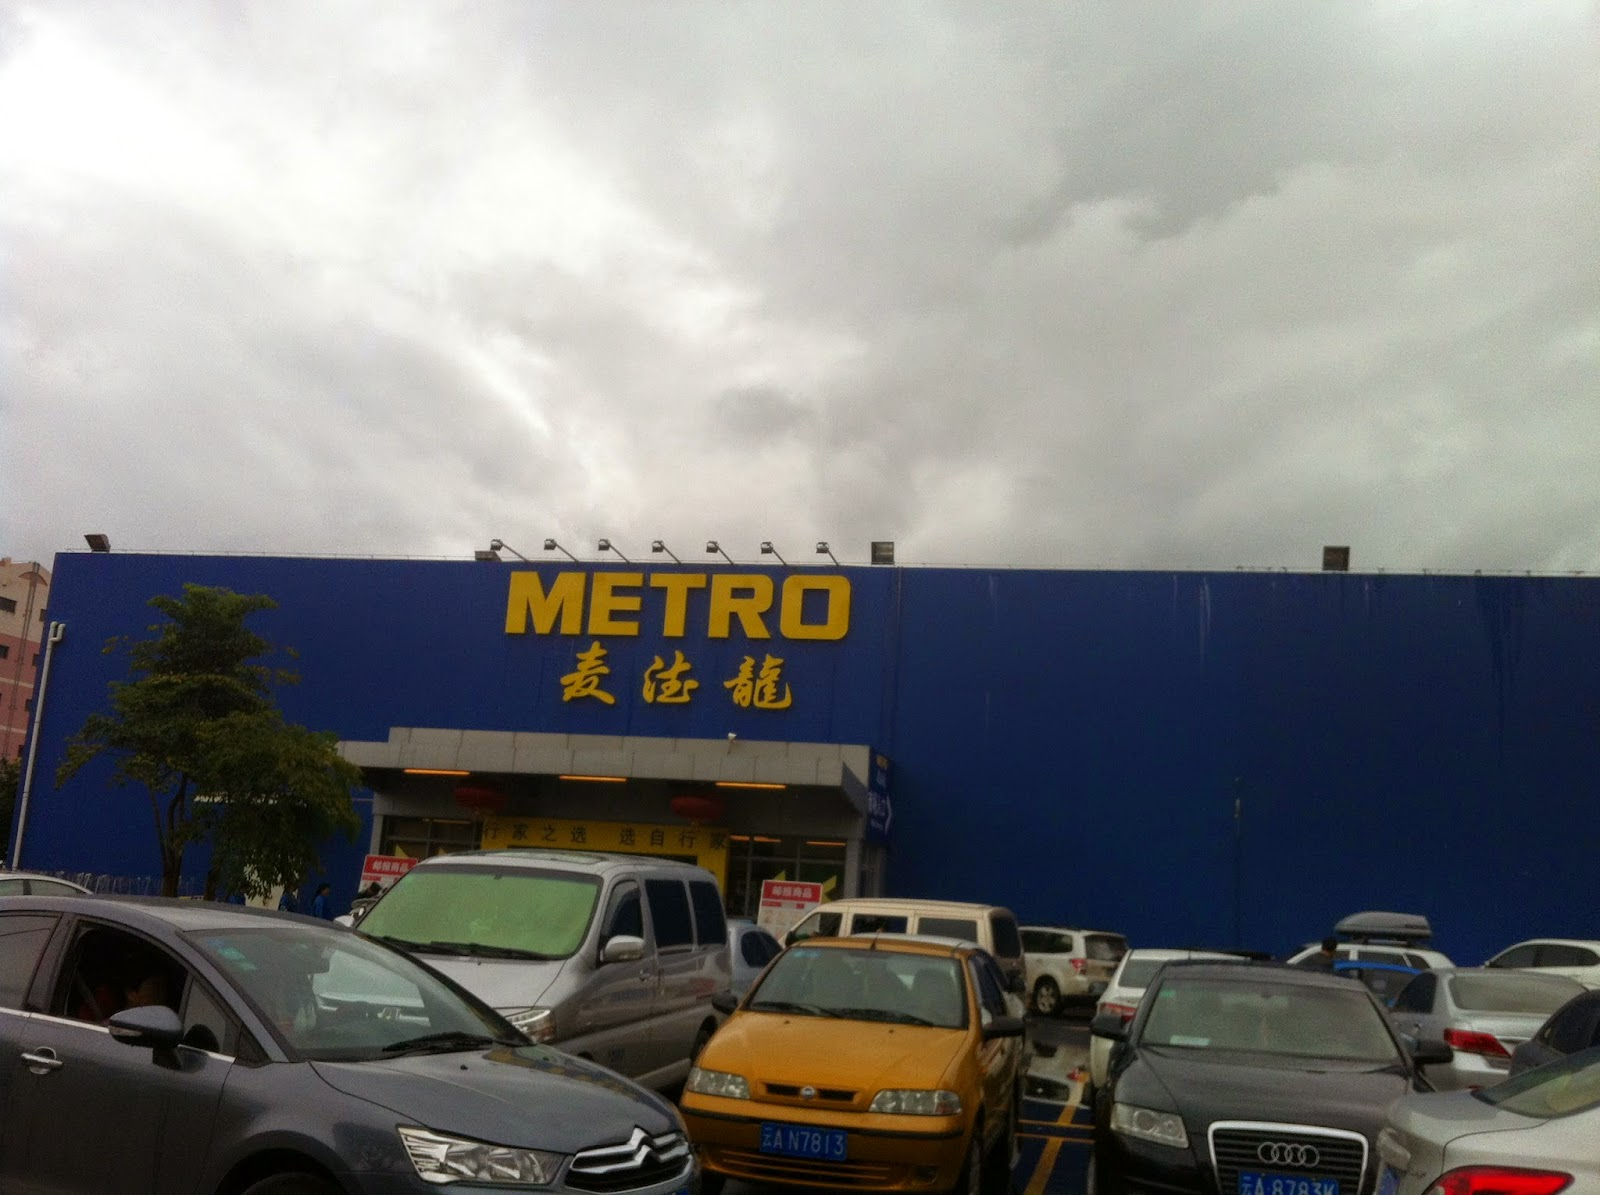 Metro Grocery Store in Kunming